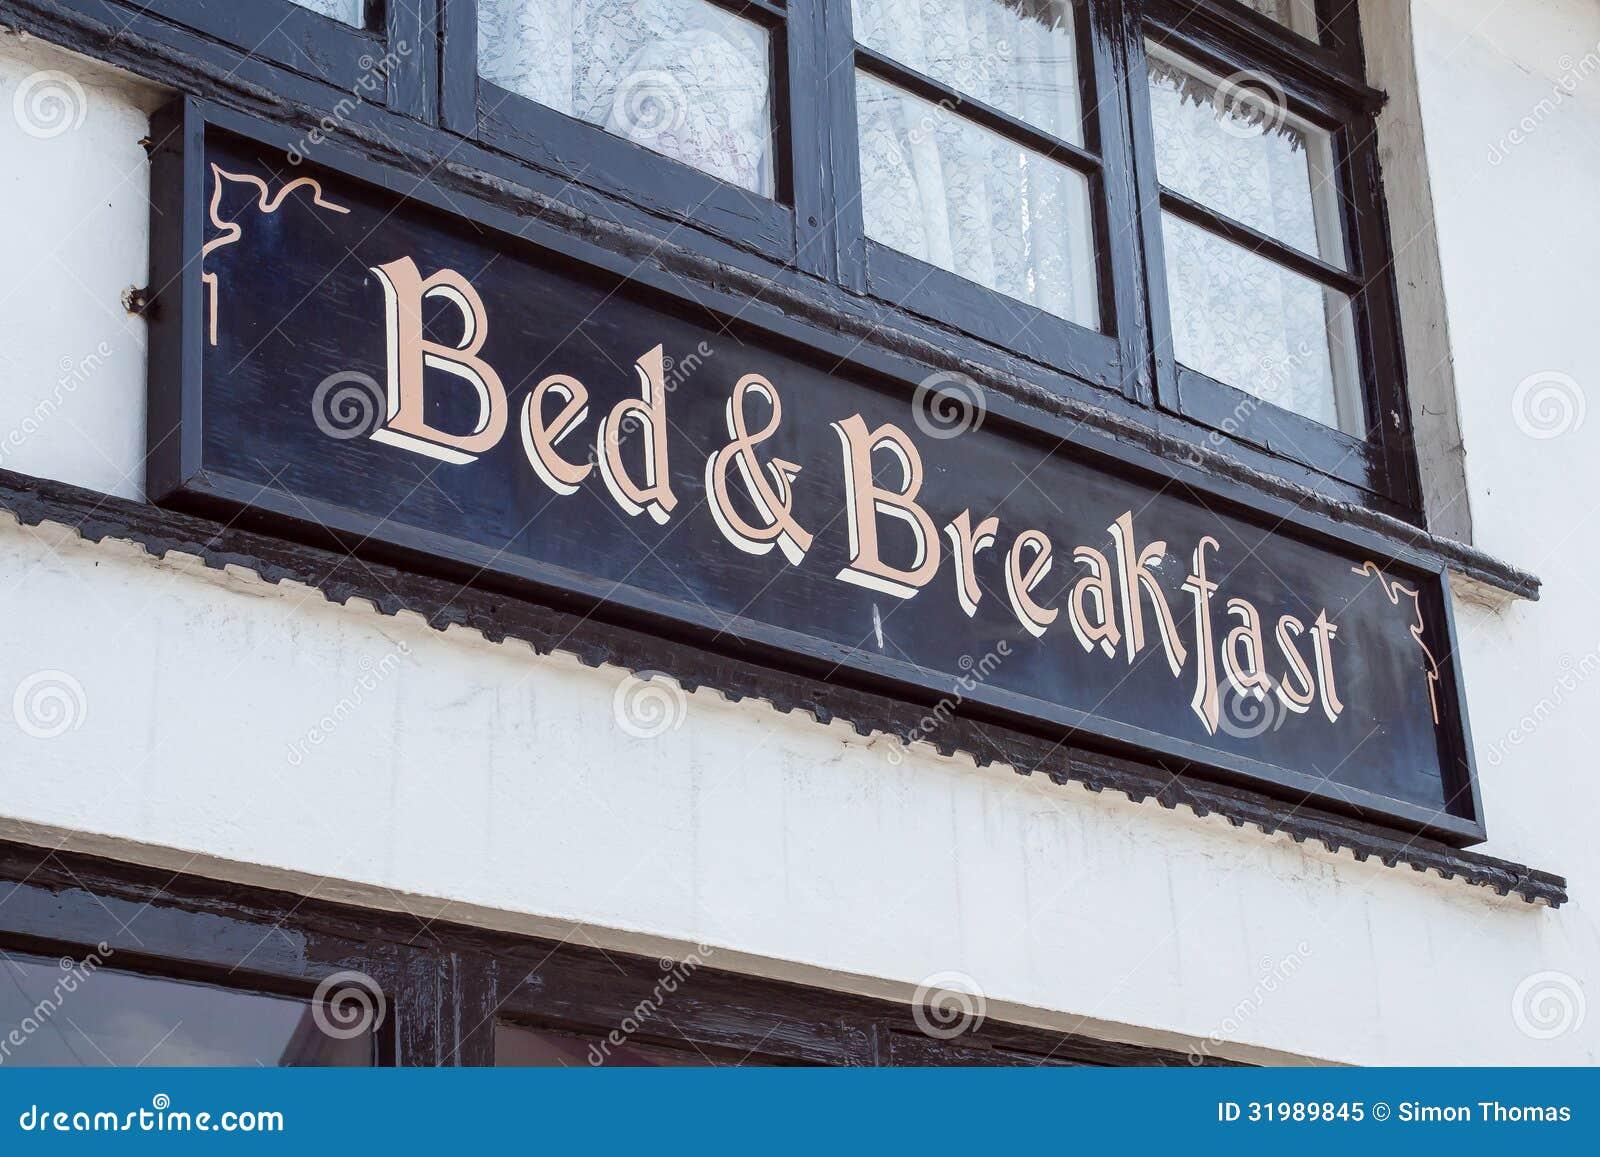 Download Bed & Breakfast stock image. Image of sign, breakfast - 31989845